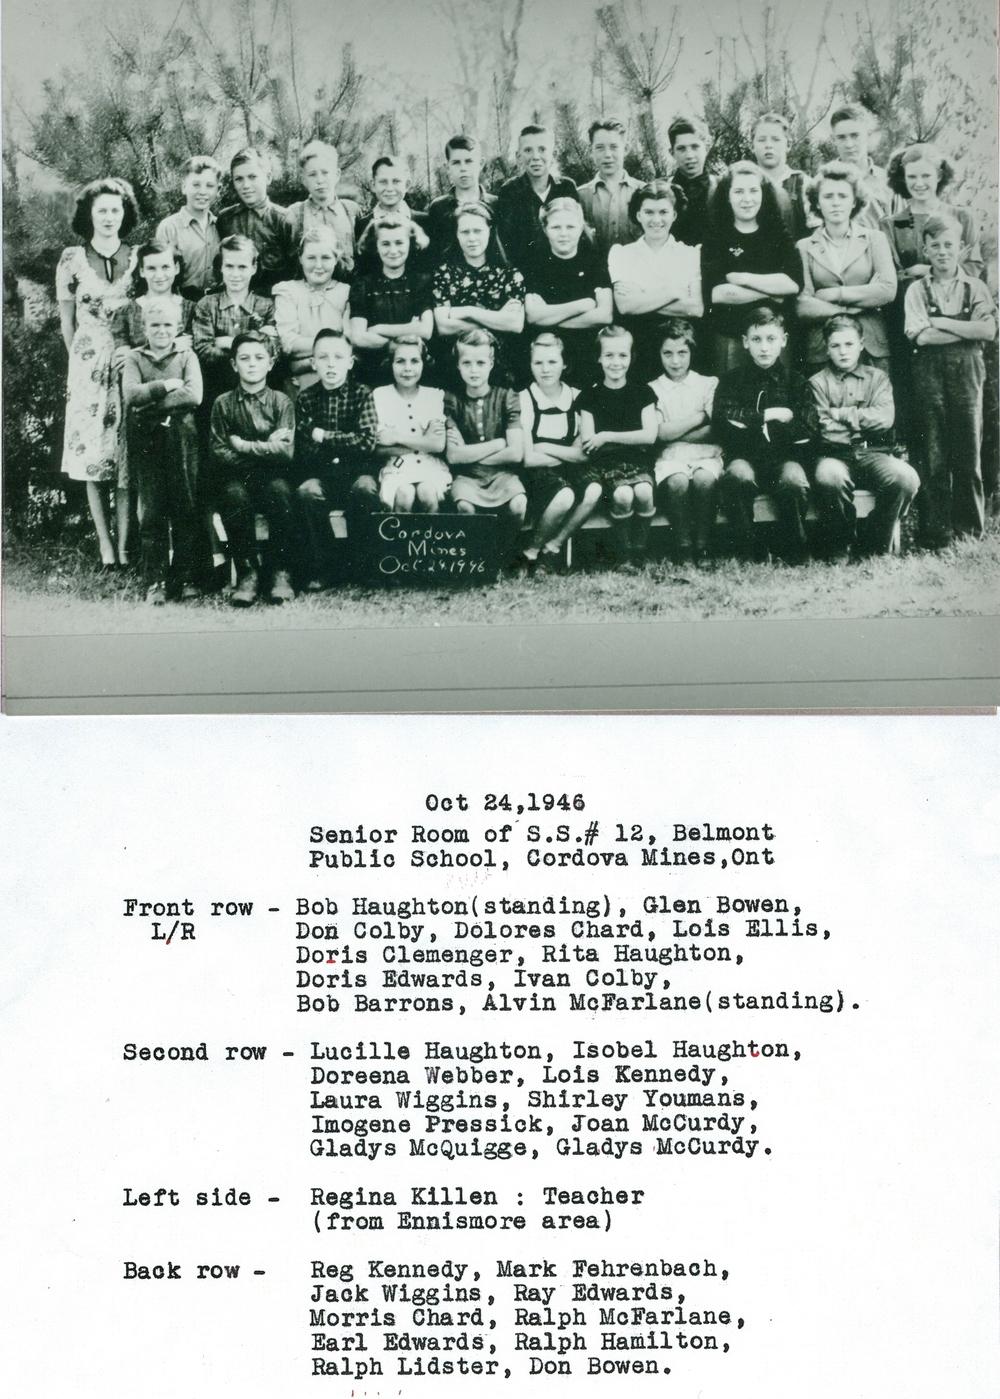 S.S. 12 Belmont Public School, Cordova Mines 1946.jpg